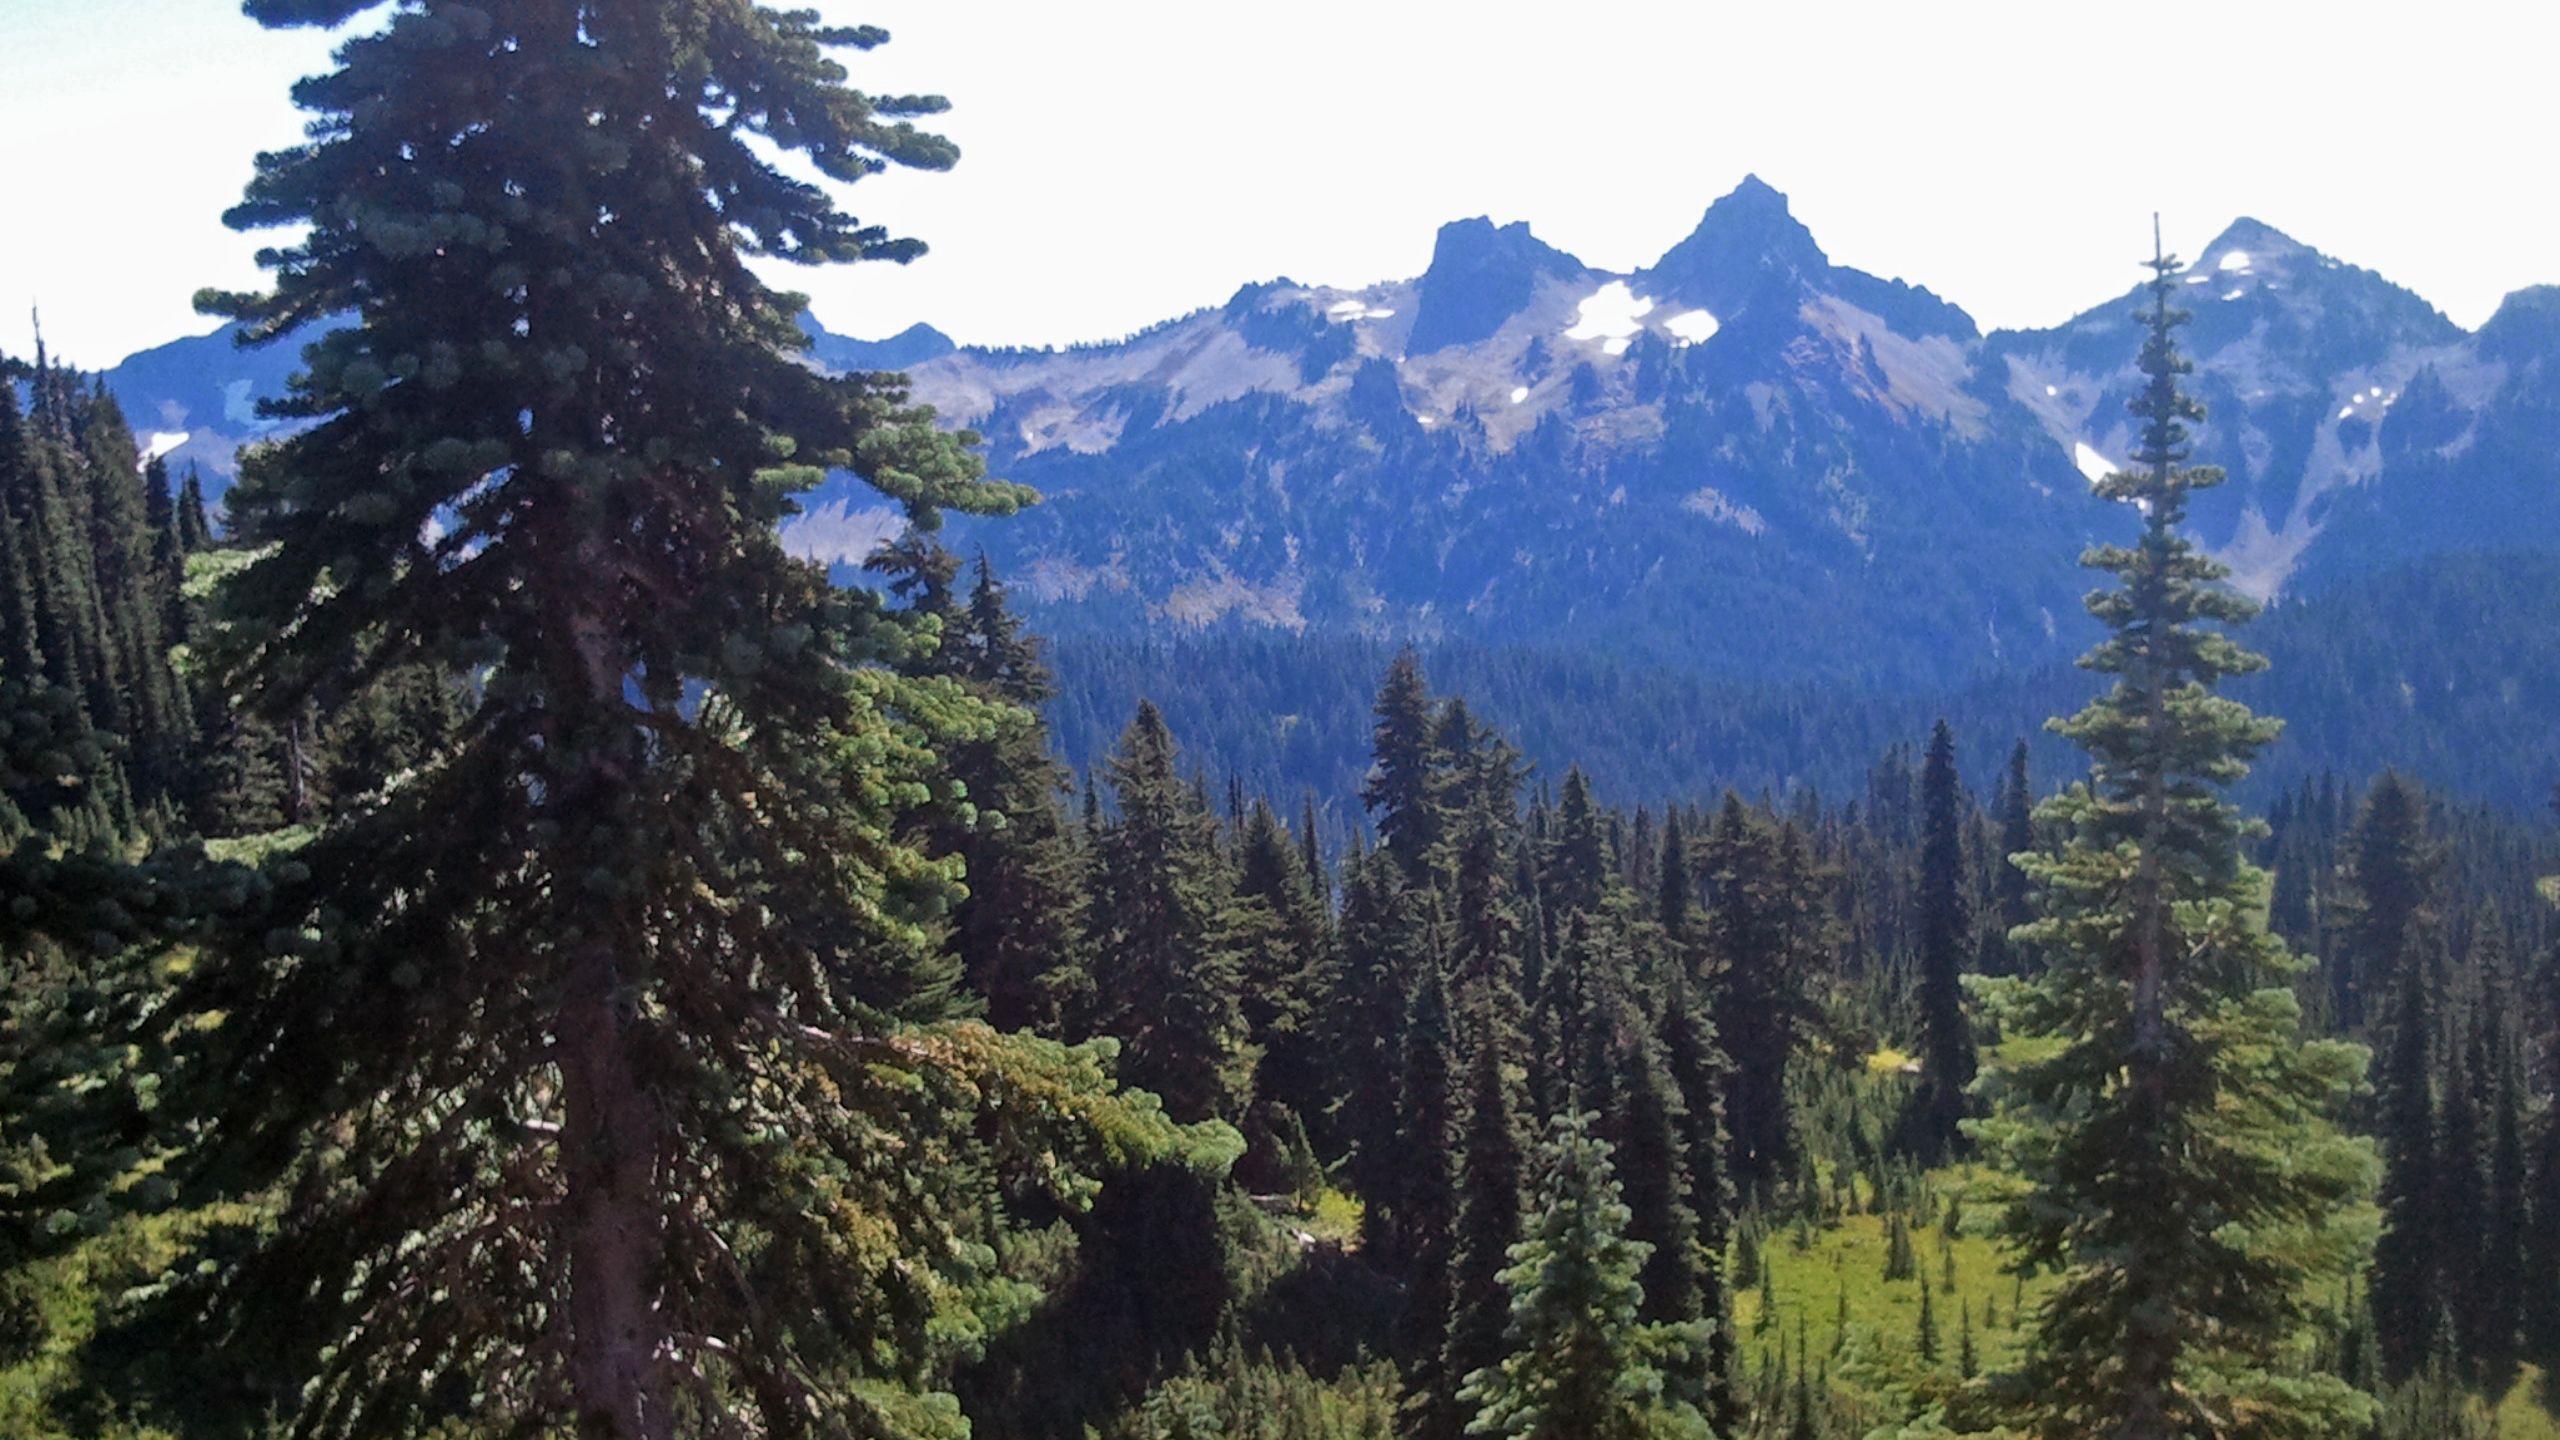 mountain view near seattle